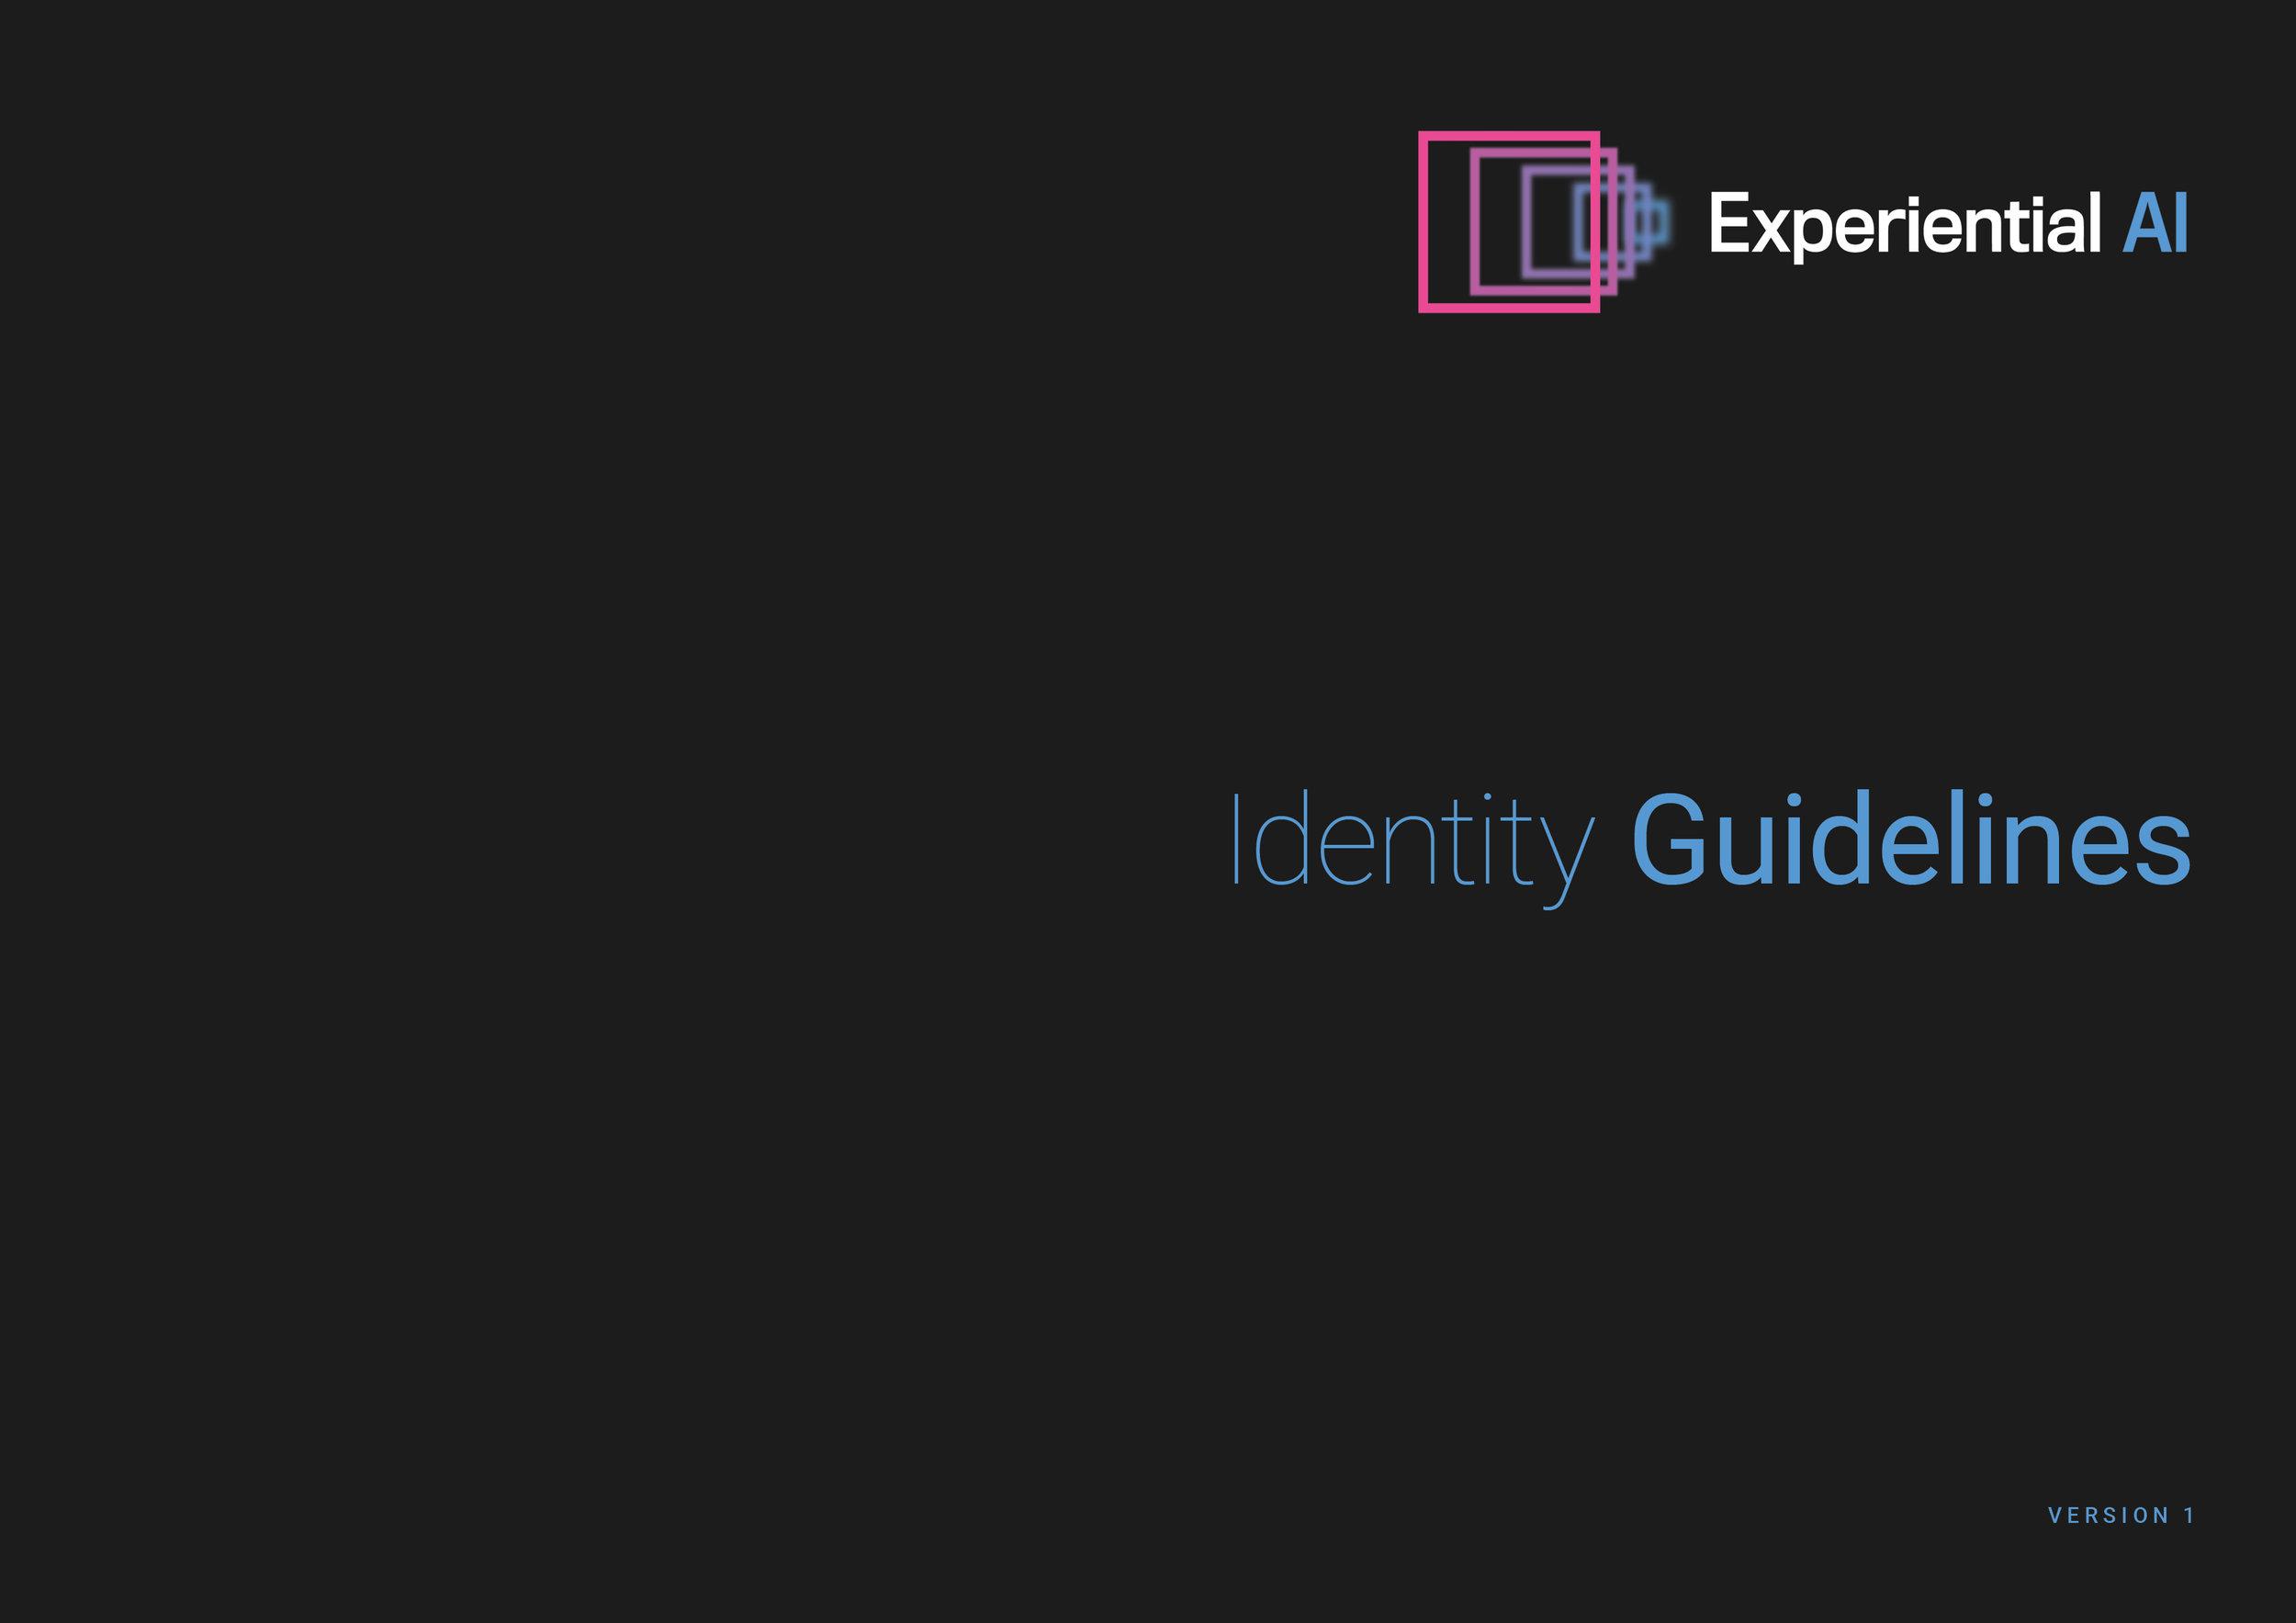 EAI_Identity_Guidelines.jpg